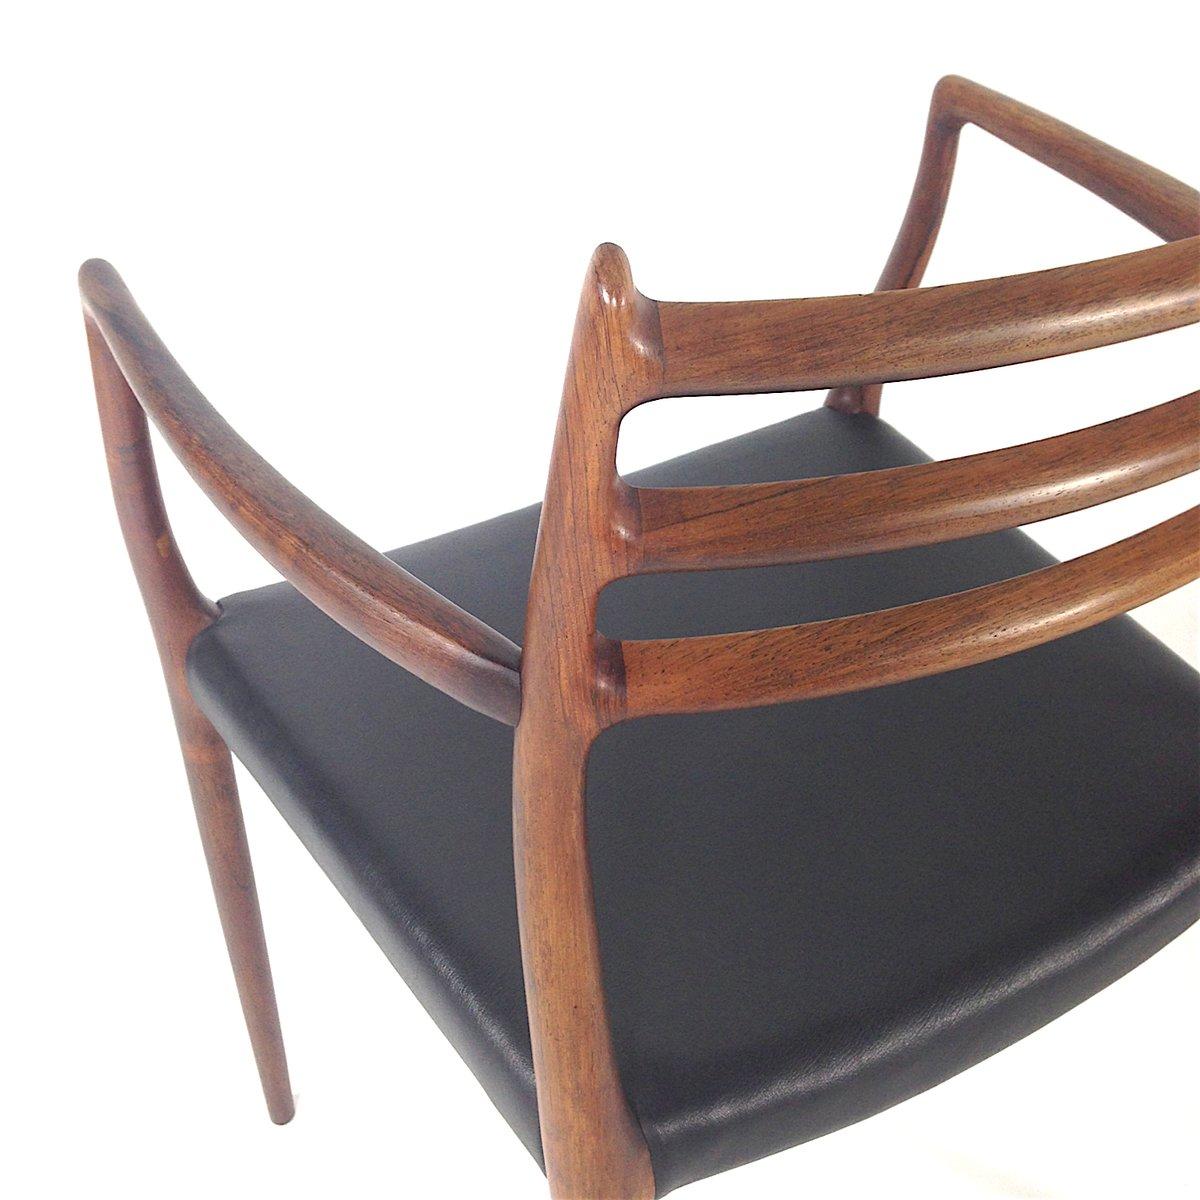 Danish Furniture Makers Marks